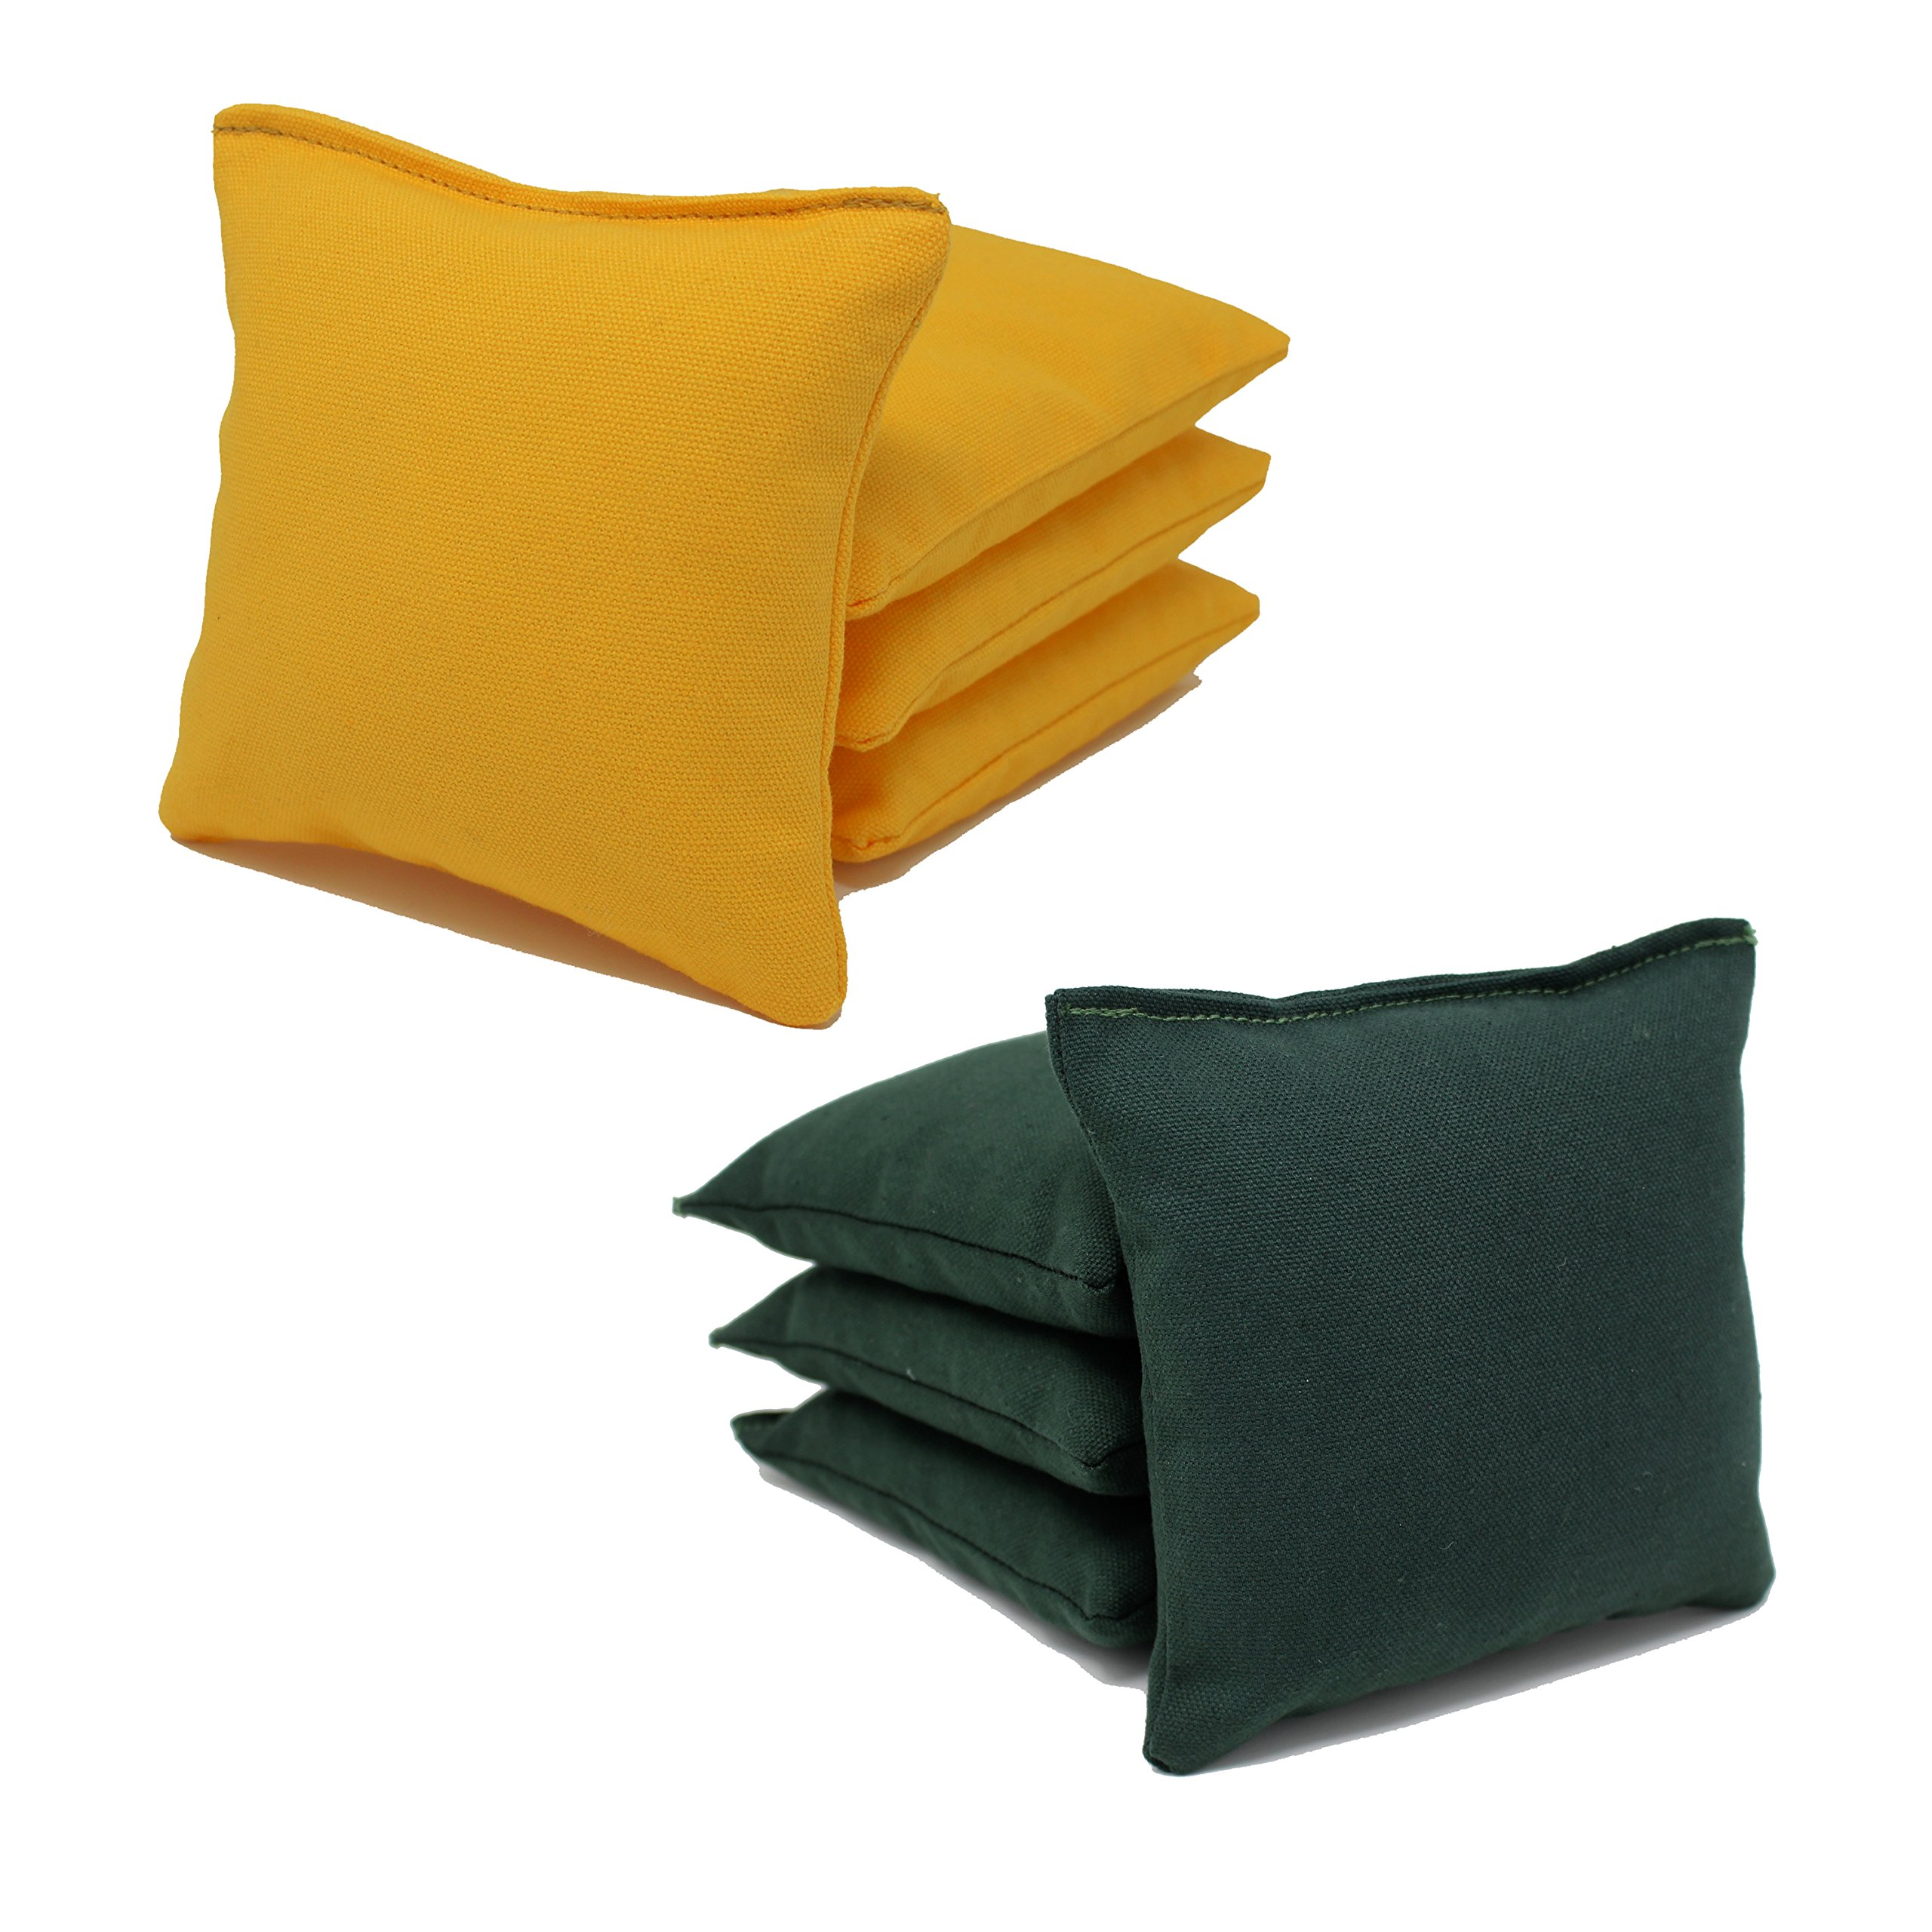 Cornhole Bags Set - (4 Yellow, 4 Hunter Green) By Free Donkey Sports by Free Donkey Sports